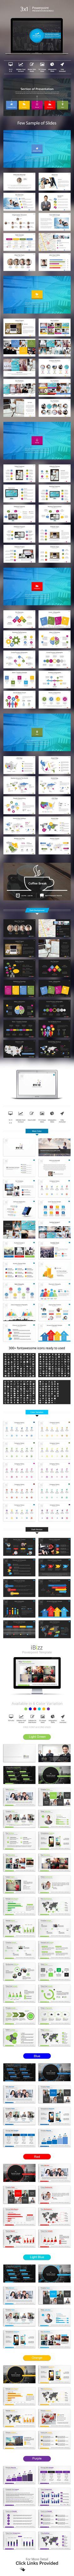 Powerpoint Presentation Bundle Vol.1